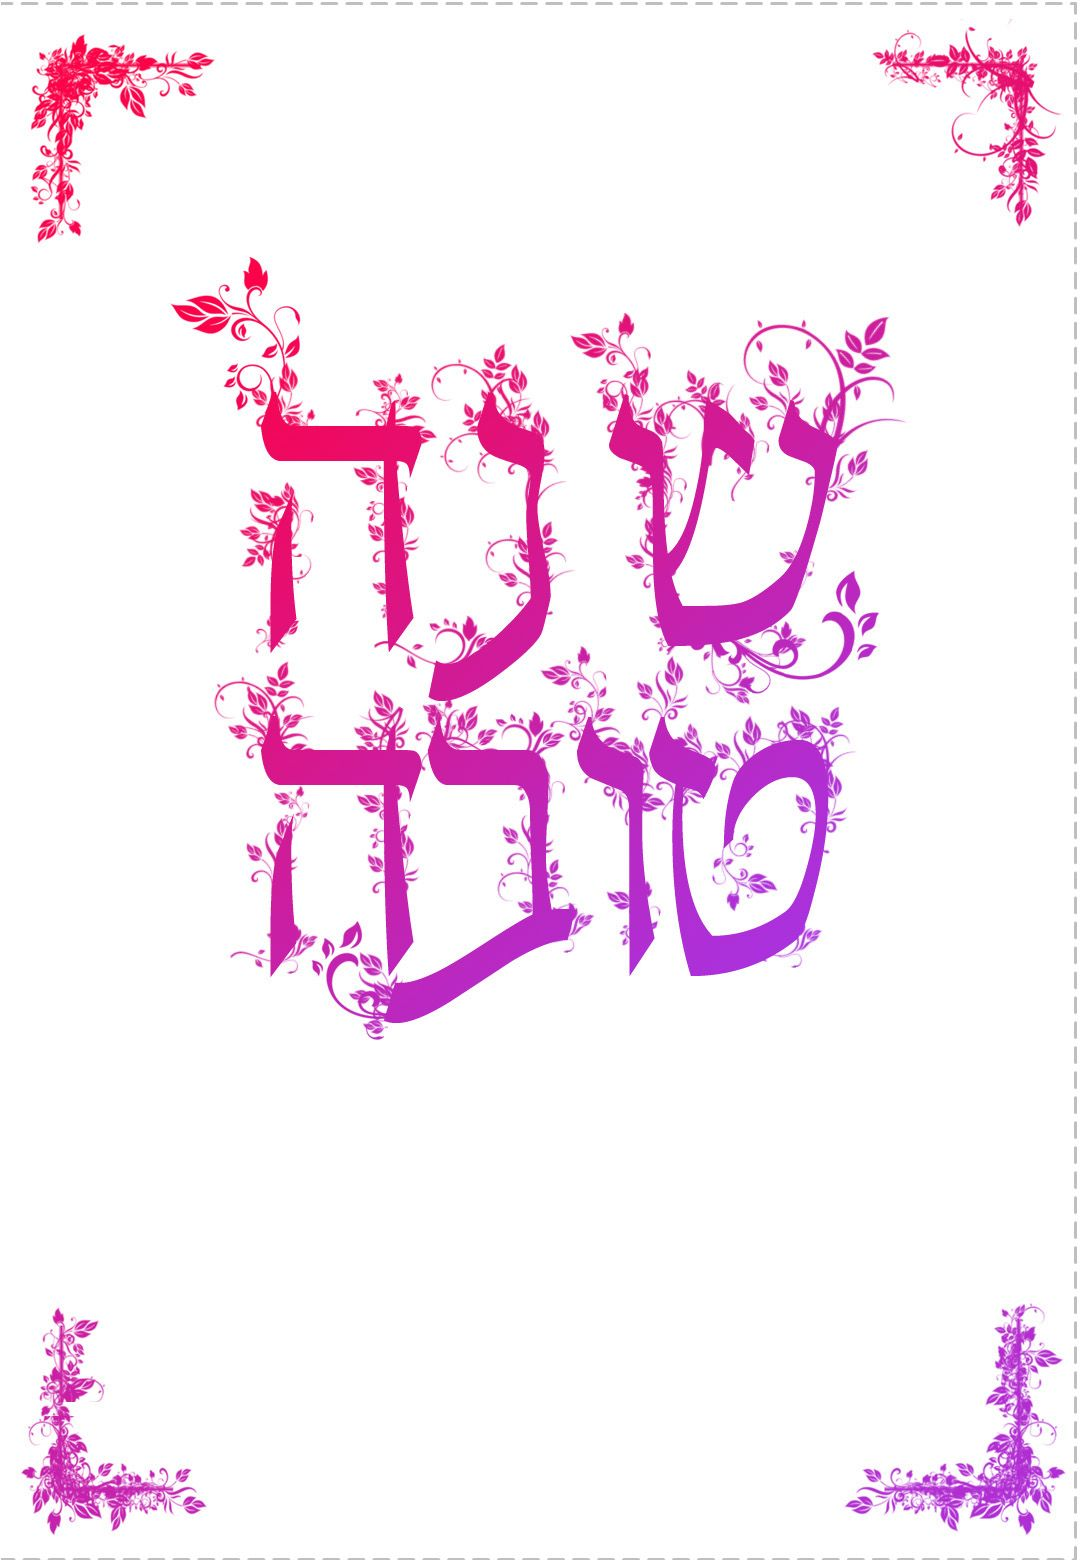 Free Printable Decorated Shana Tova Greeting Card